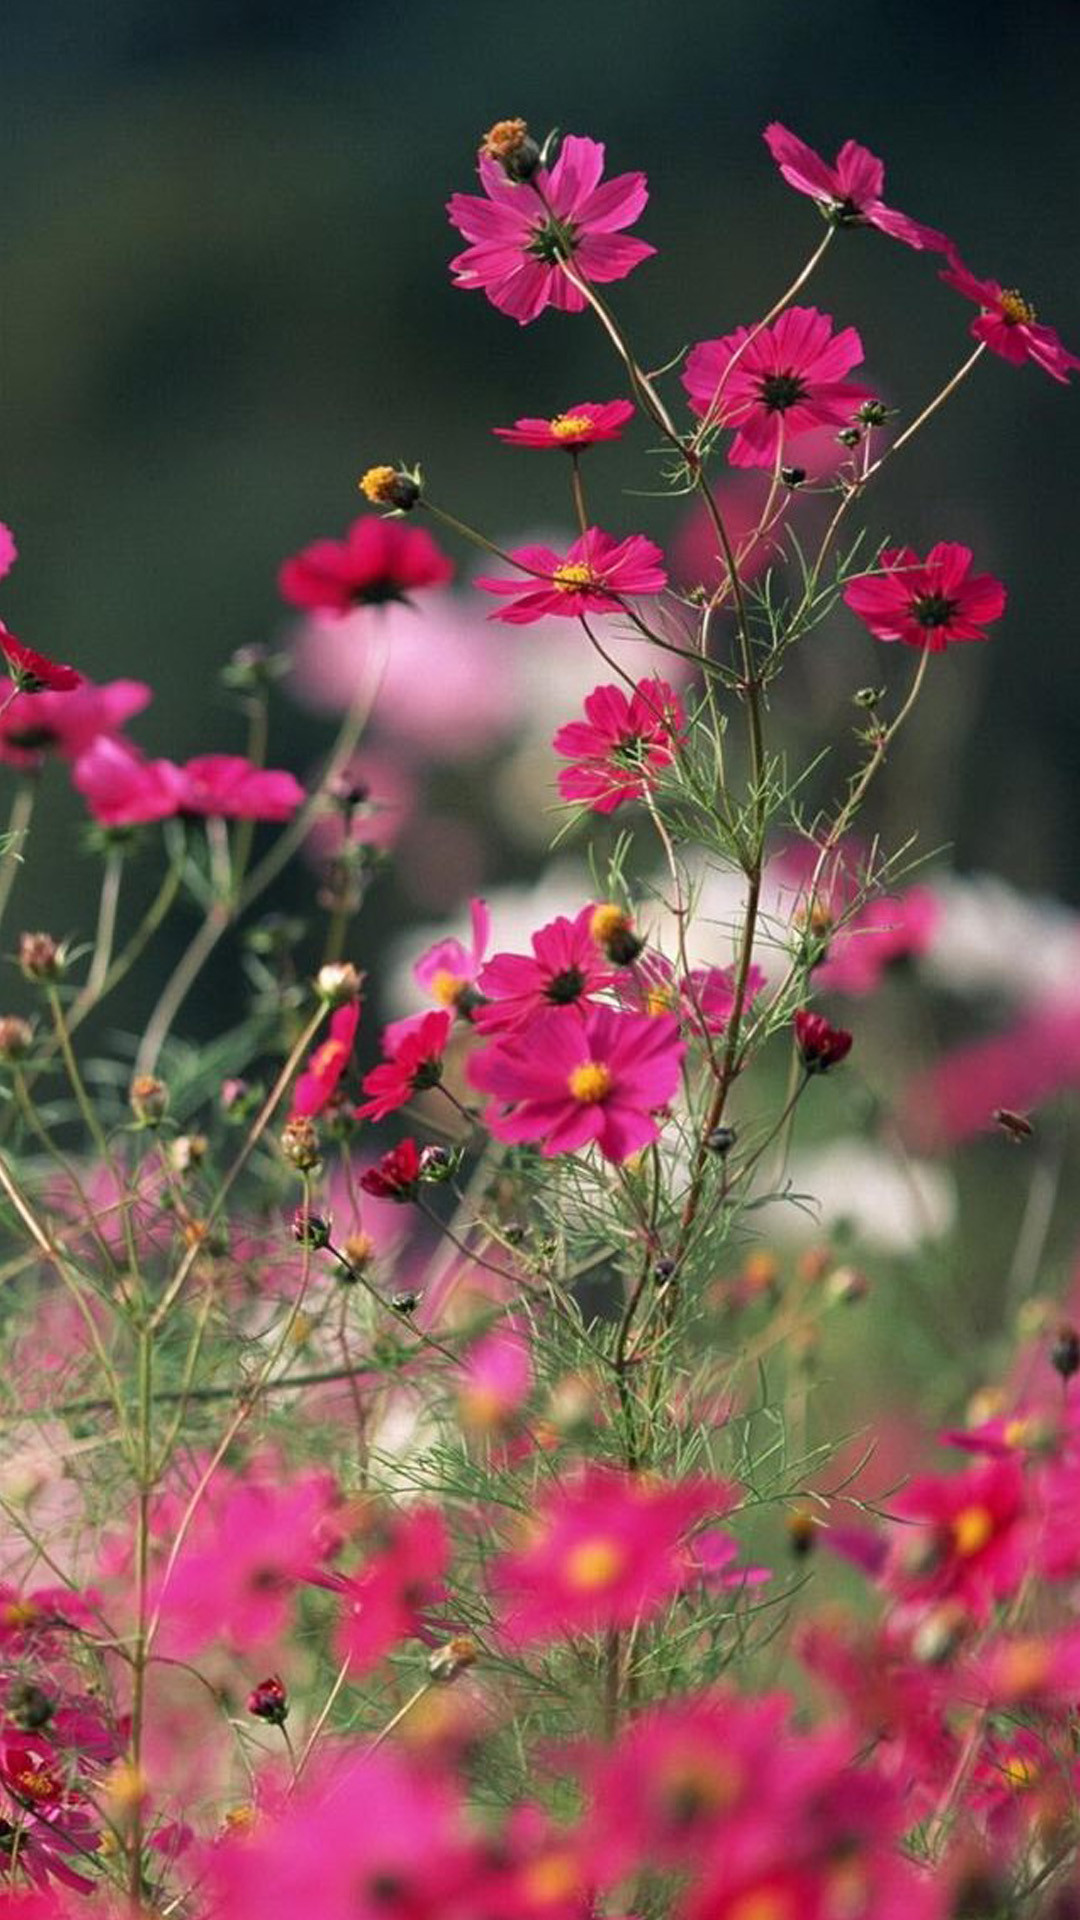 Free Download Flower Wallpaper Iphone 84 Images 1080x1920 For Your Desktop Mobile Tablet Explore 56 Flower Iphone 7 Plus Wallpaper Flower Iphone 7 Plus Wallpaper Iphone 7 Plus Wallpaper Iphone 7 Plus Wallpapers